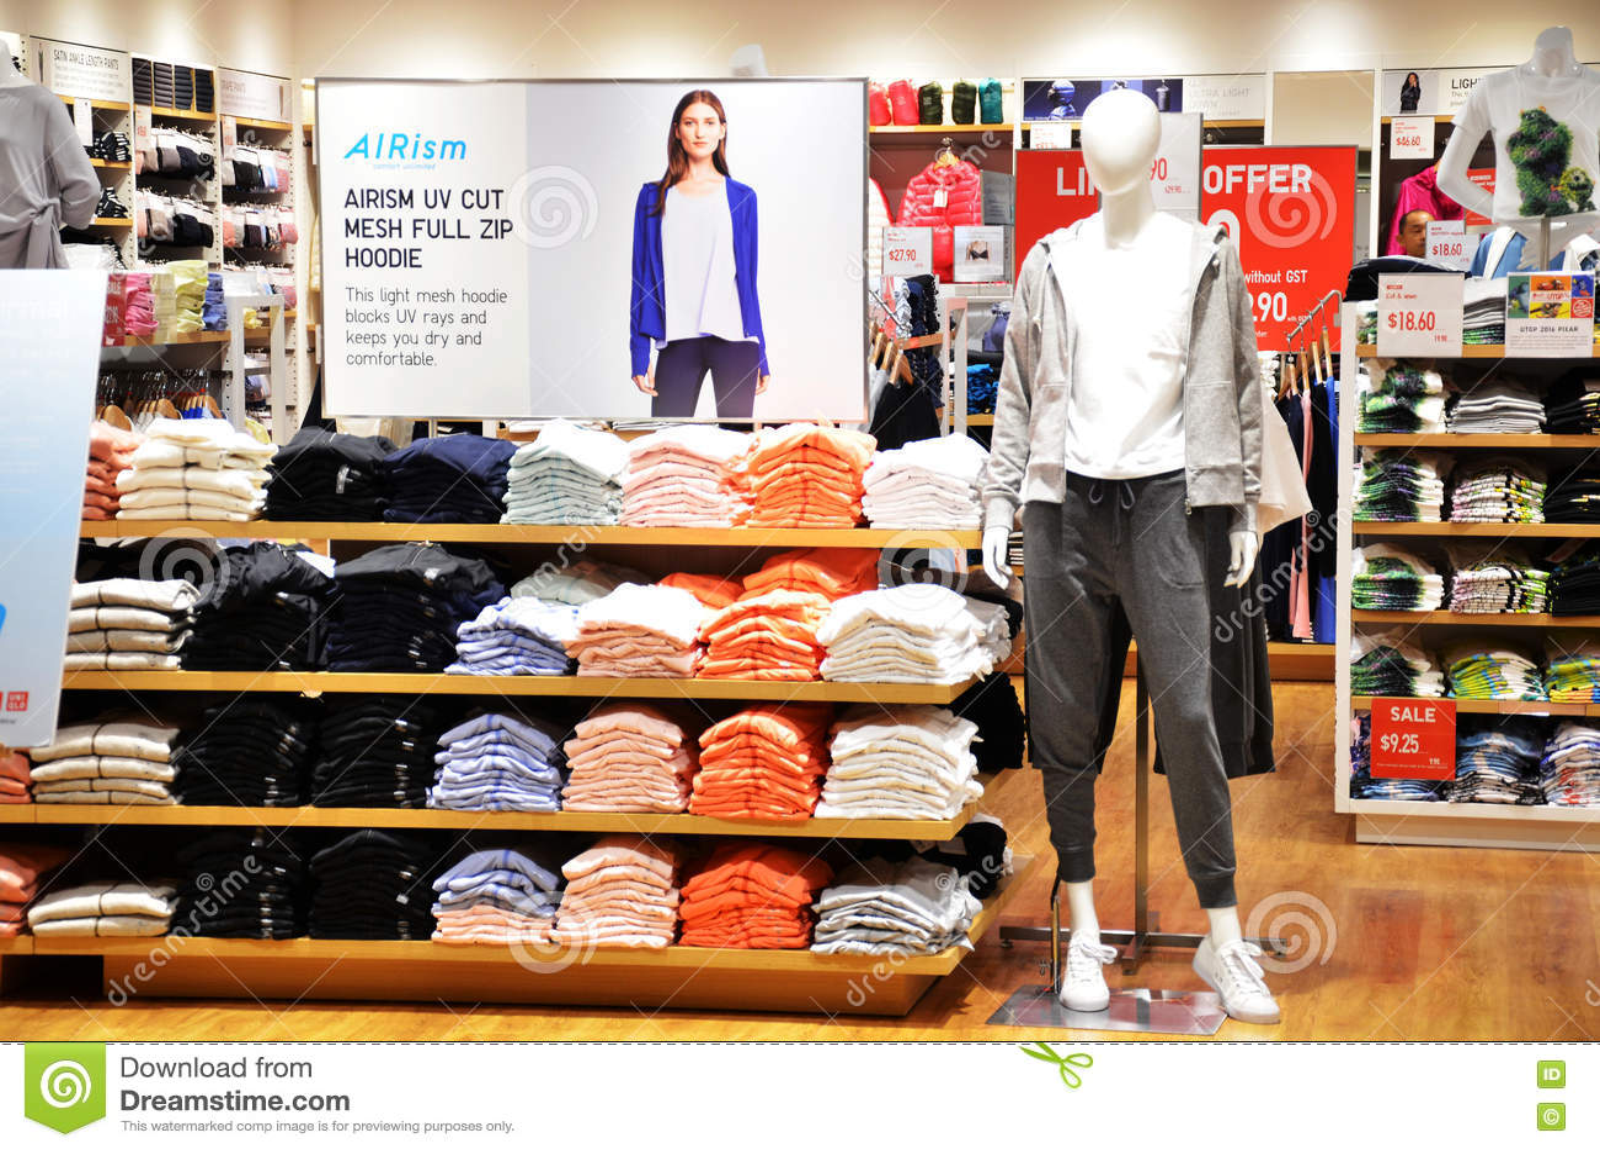 Uniqlo Store In Changi Airport, Singapore Editorial Stock Image ...